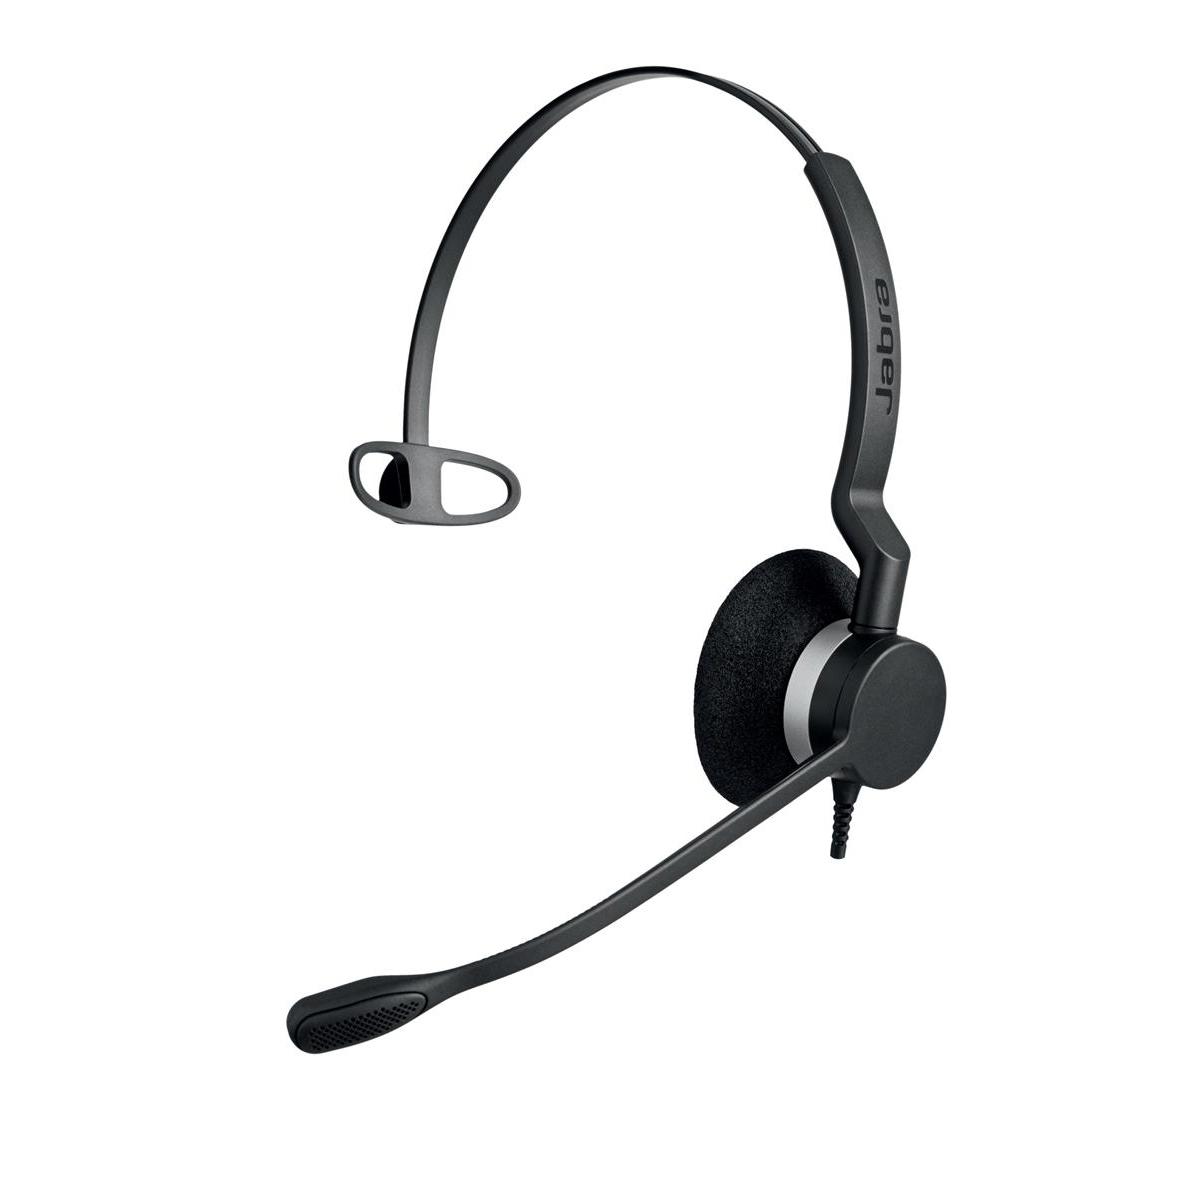 Jabra BIZ 2300 Mono Noise Cancelling Headset Ref 2303-820-104